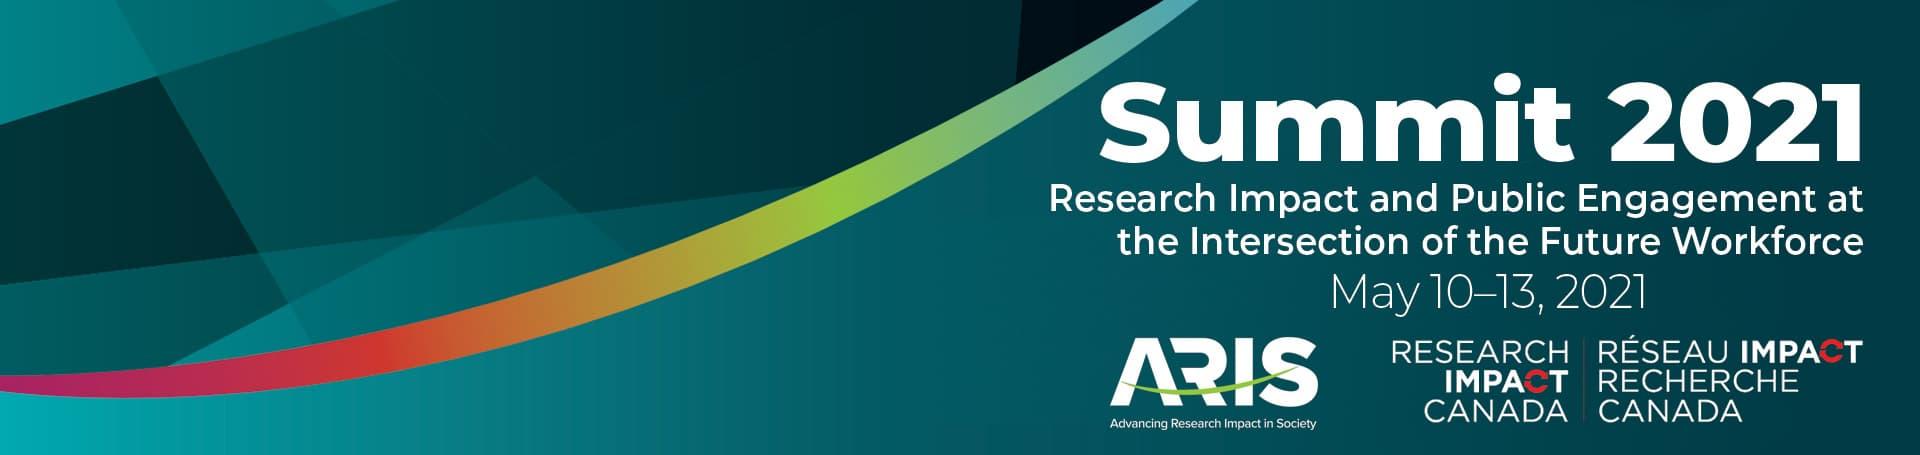 ARIS Summit 2021